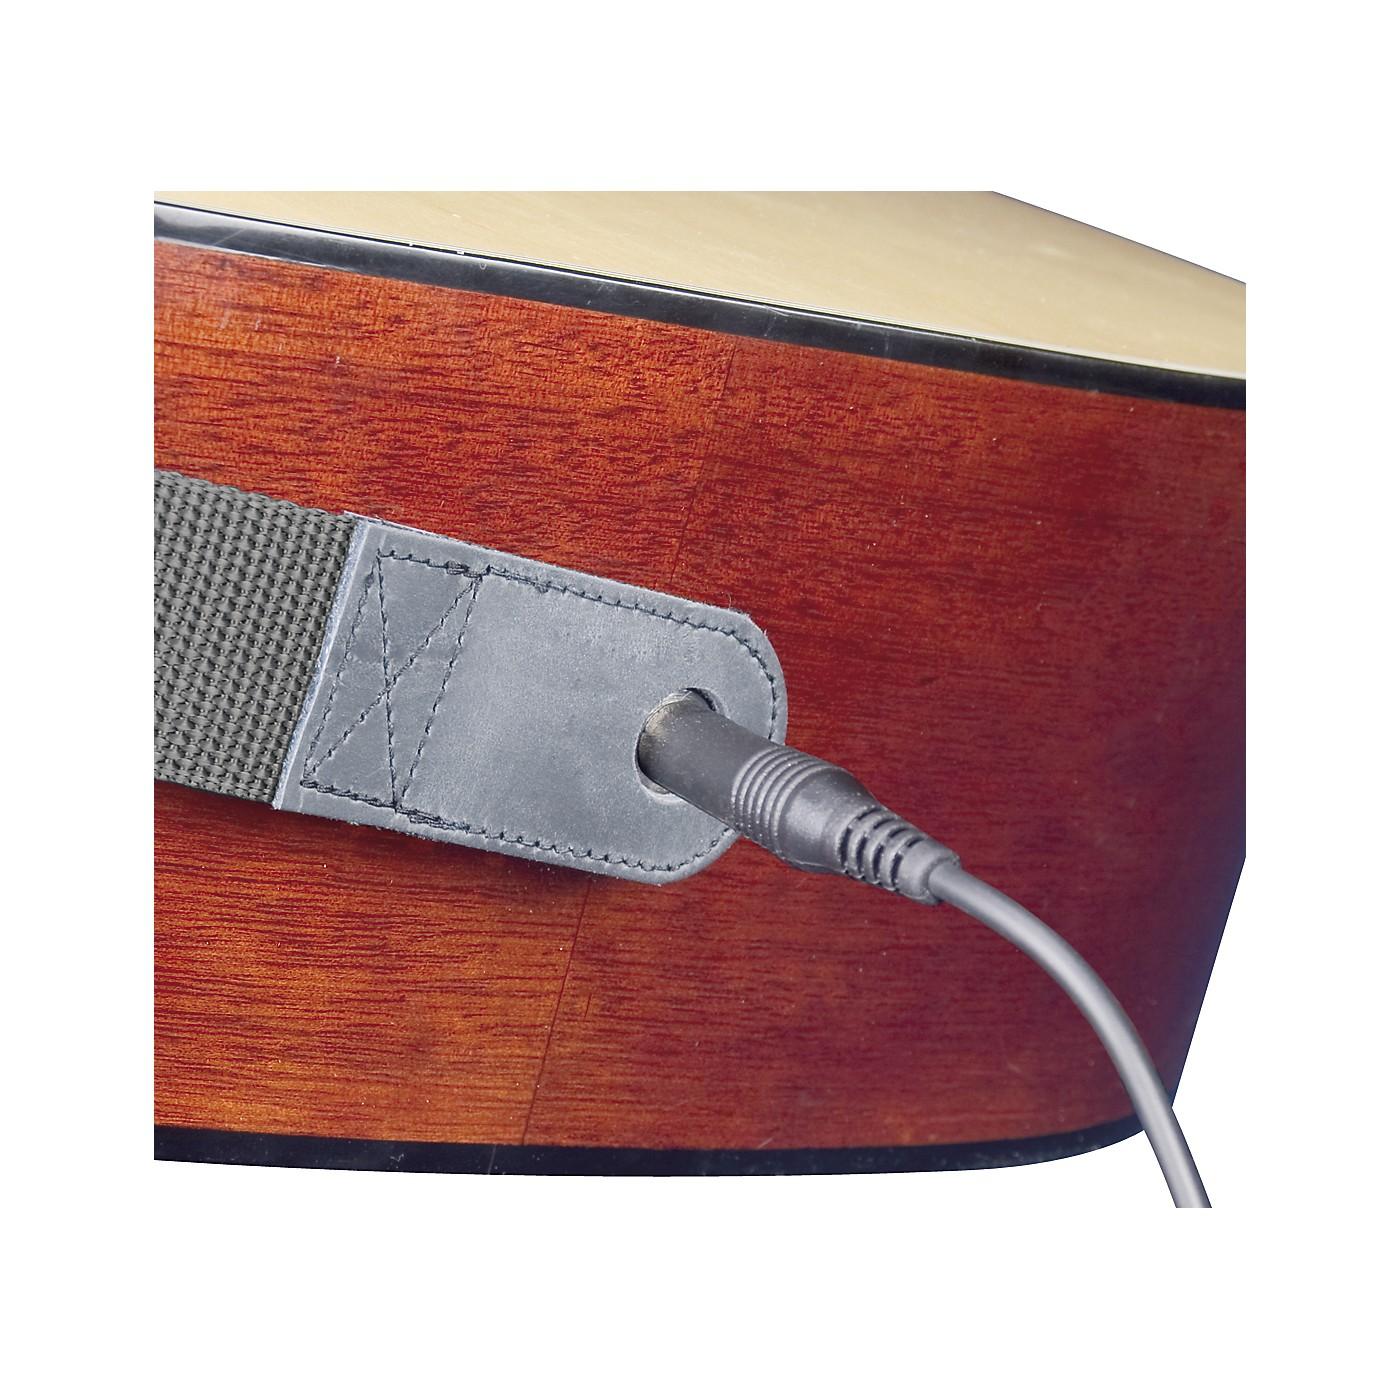 Neotech Slimline Acoustic Guitar Strap - End Pin Jack Version Long thumbnail